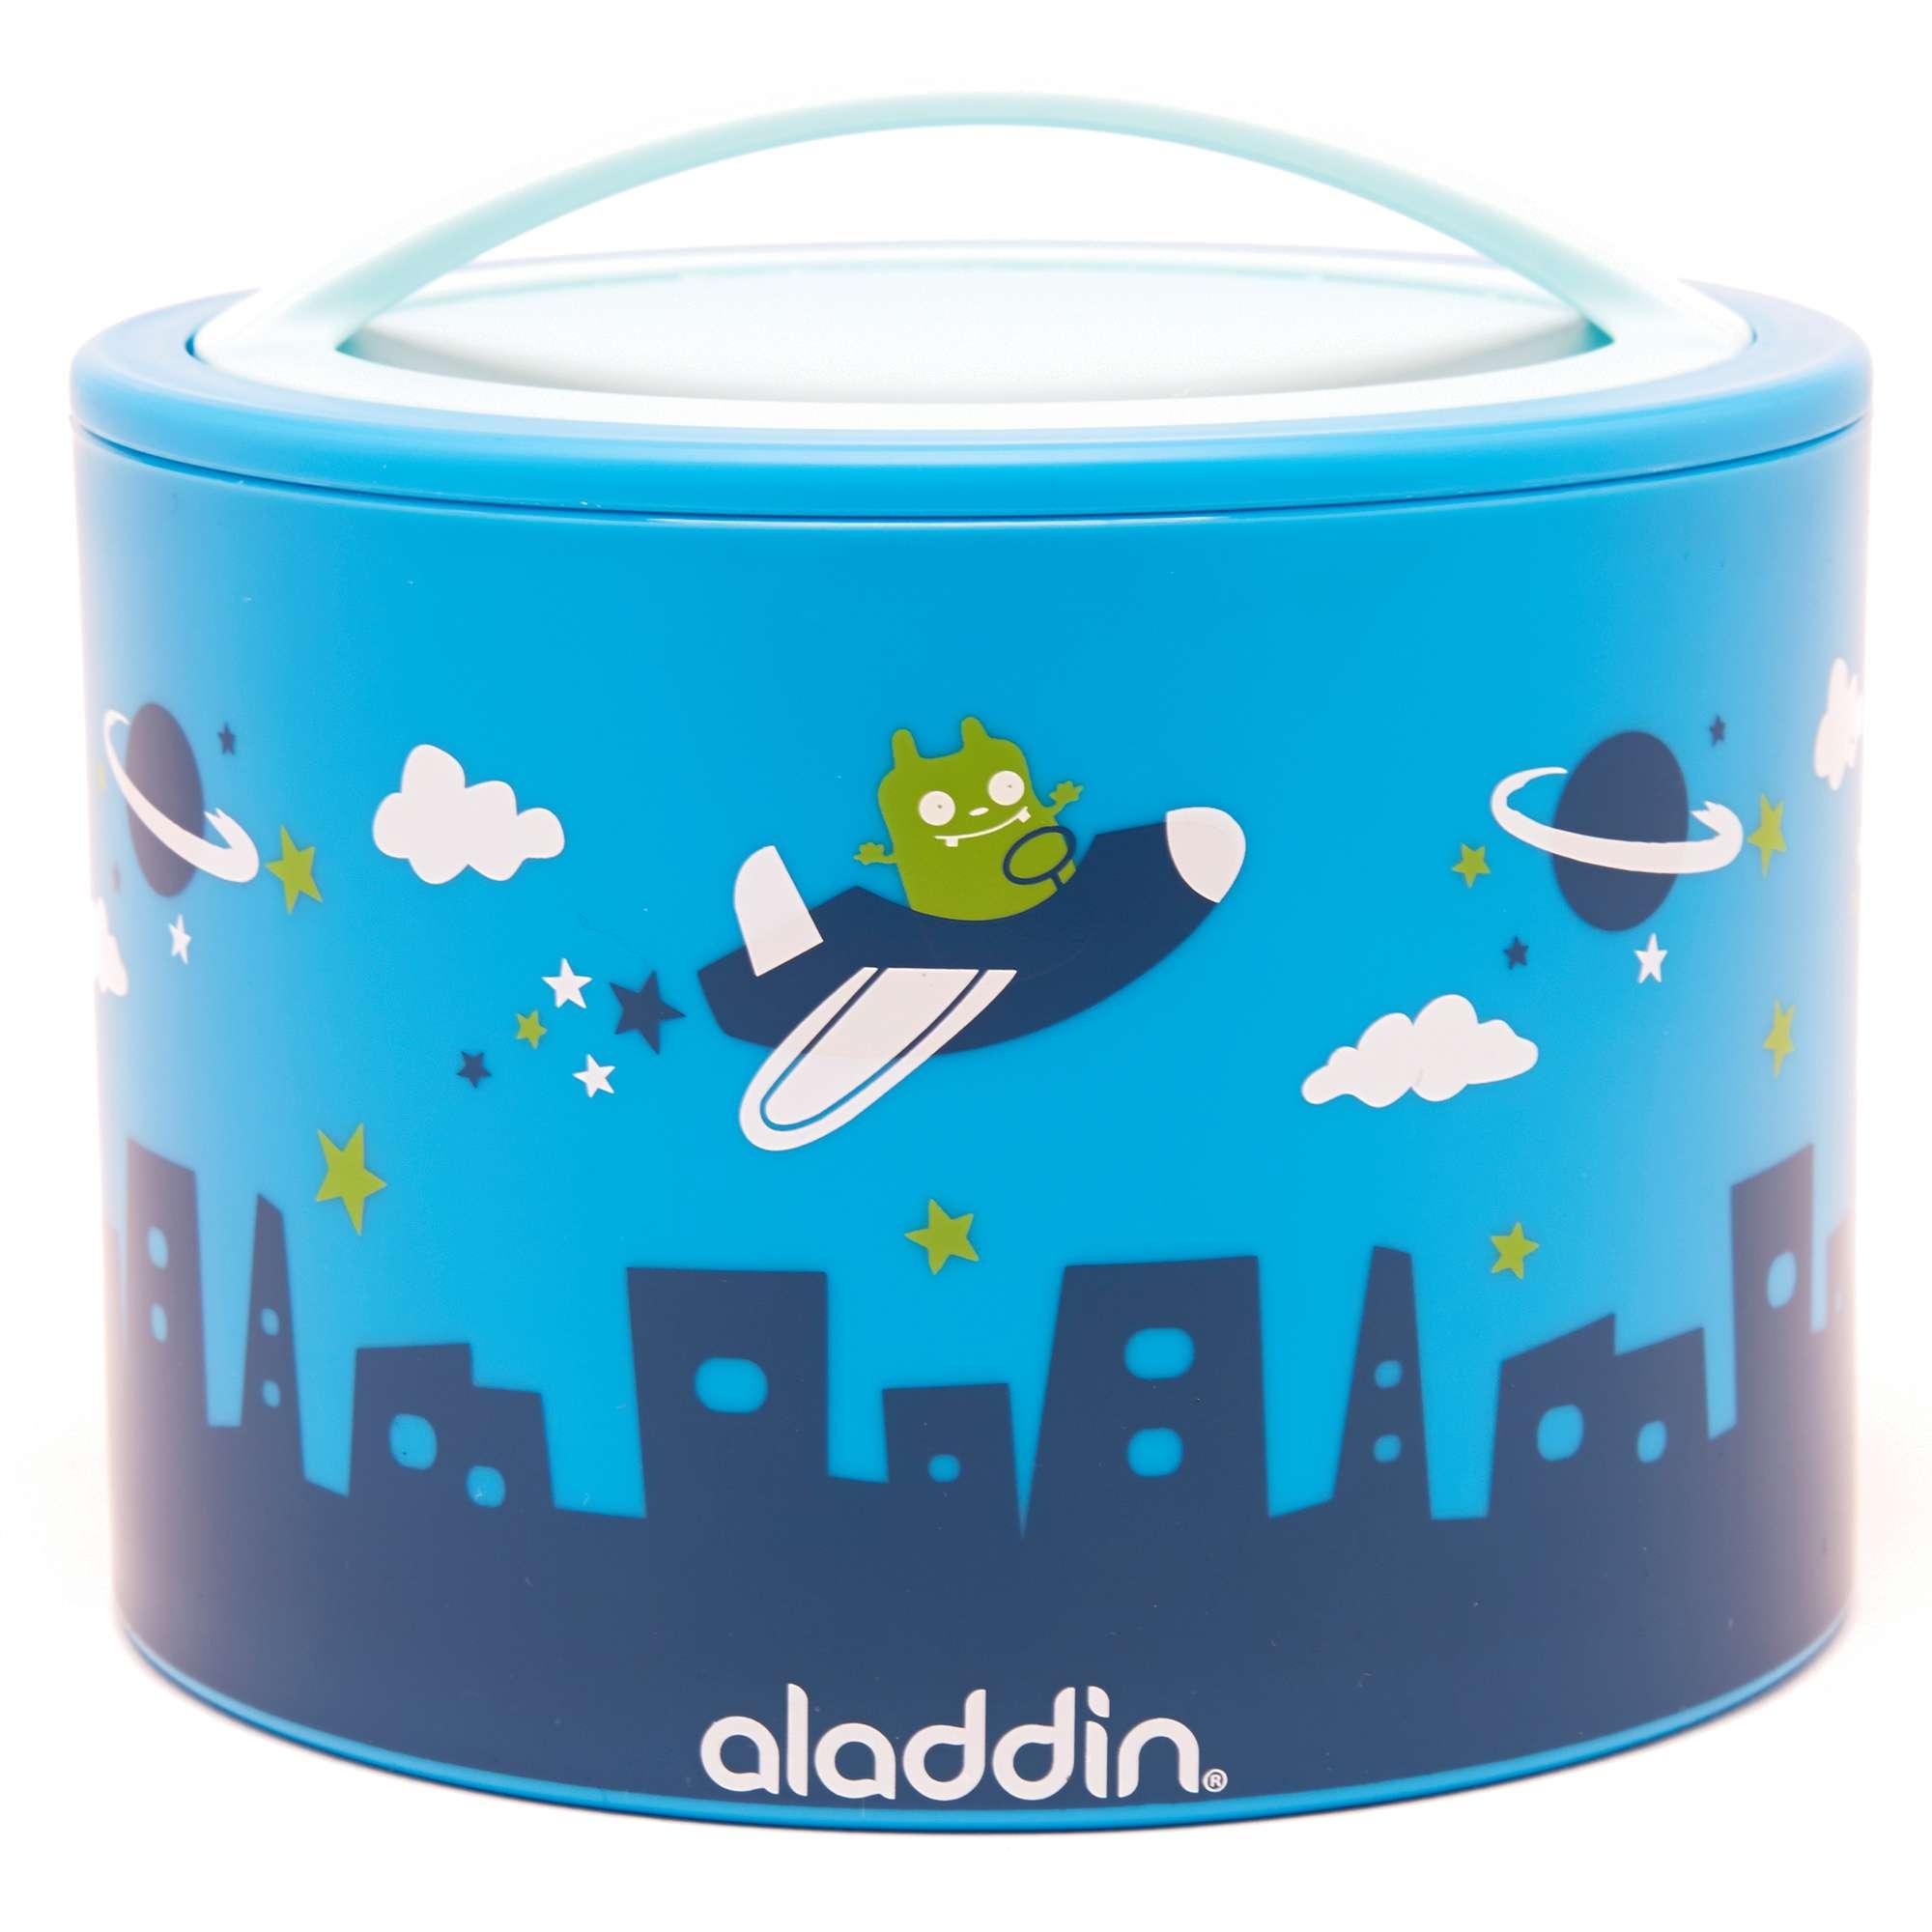 ALADDIN Boy's Bento Lunchbox